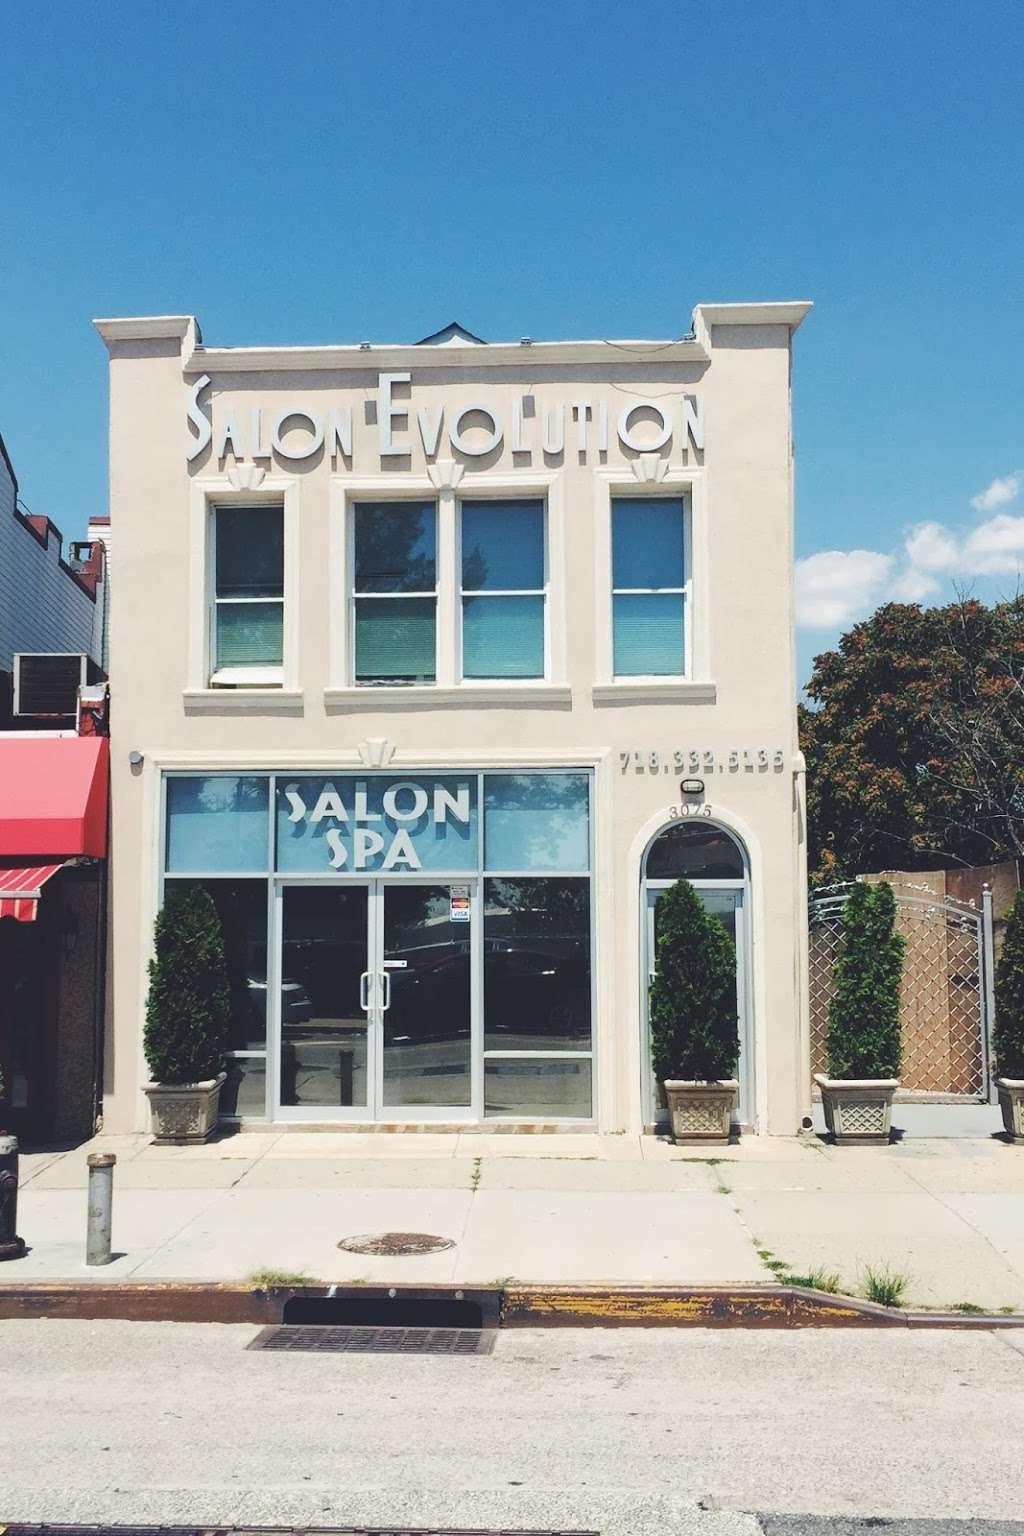 Salon Evolution LLC - hair care  | Photo 1 of 10 | Address: 3075 Emmons Ave, Brooklyn, NY 11235, USA | Phone: (718) 332-5135